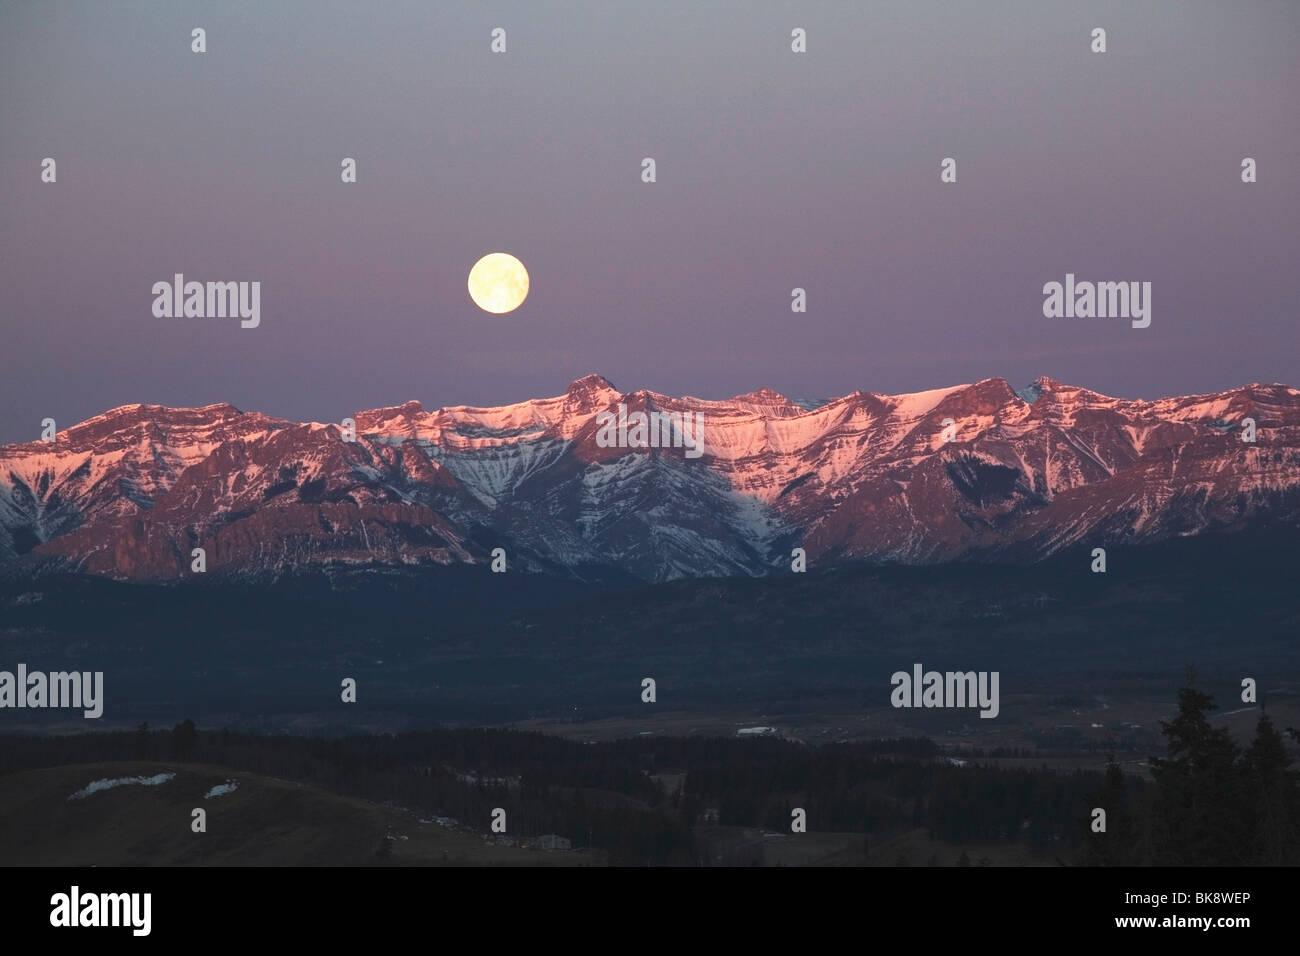 Alberta, Canada; Moon Set Over Front Range Mountains - Stock Image